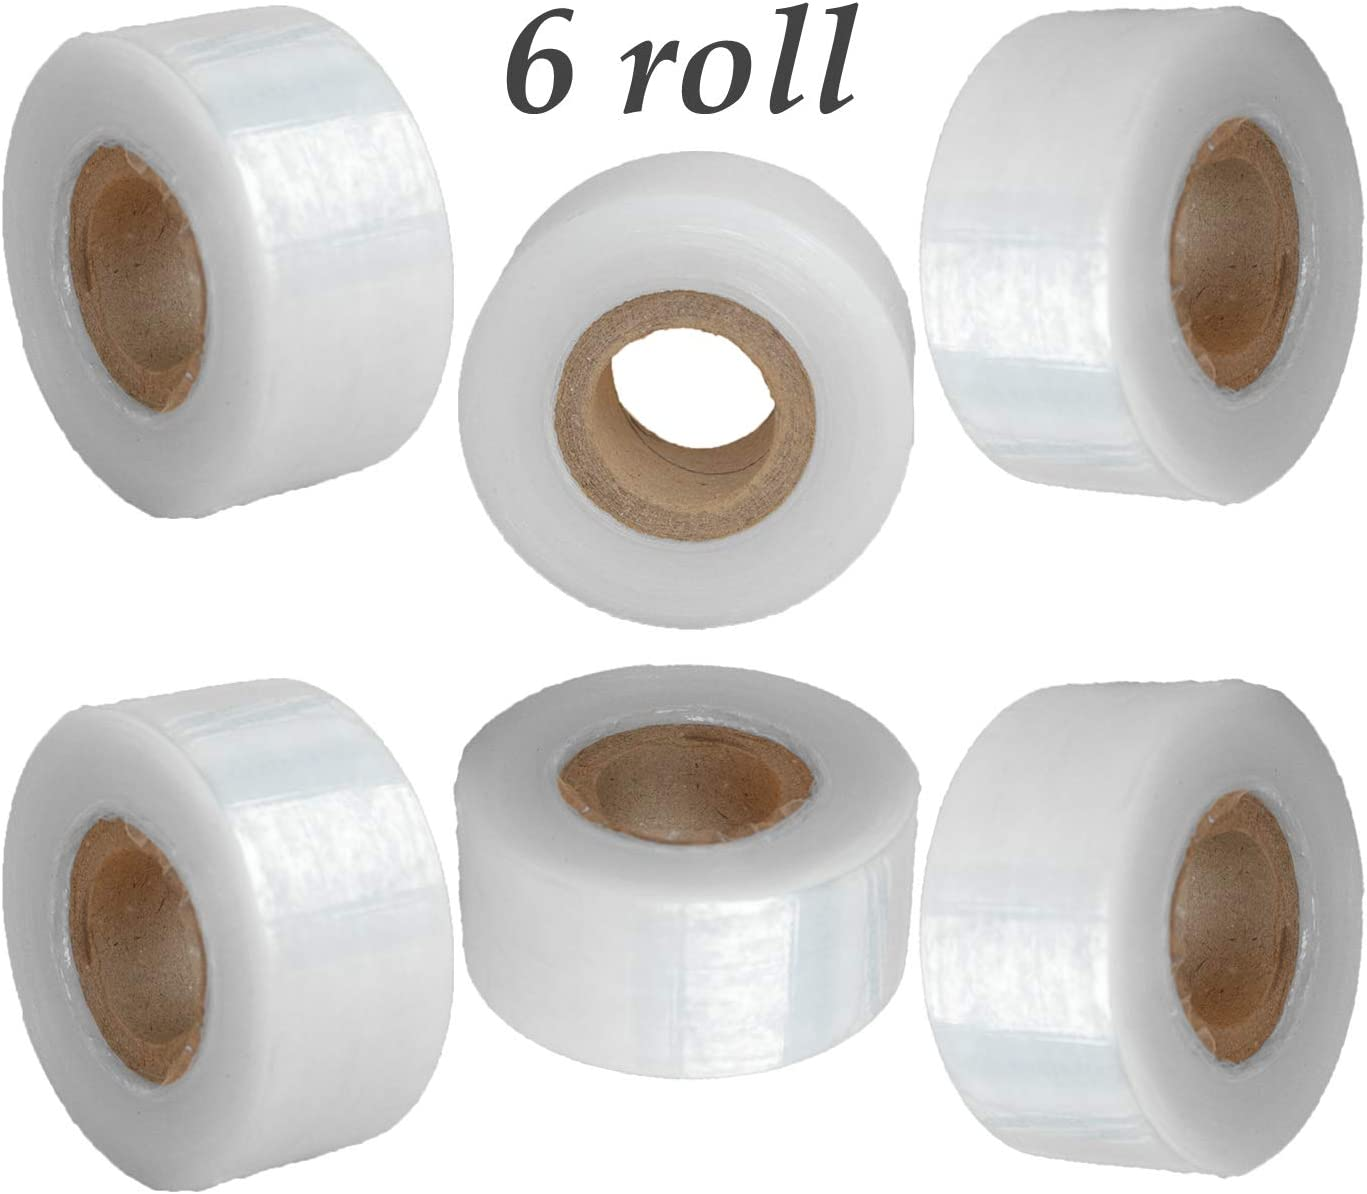 Suplklz Garden Ties Tape Plant Graft Tape Stretch Vinyl Tape Self-Adhesive Garden Tape